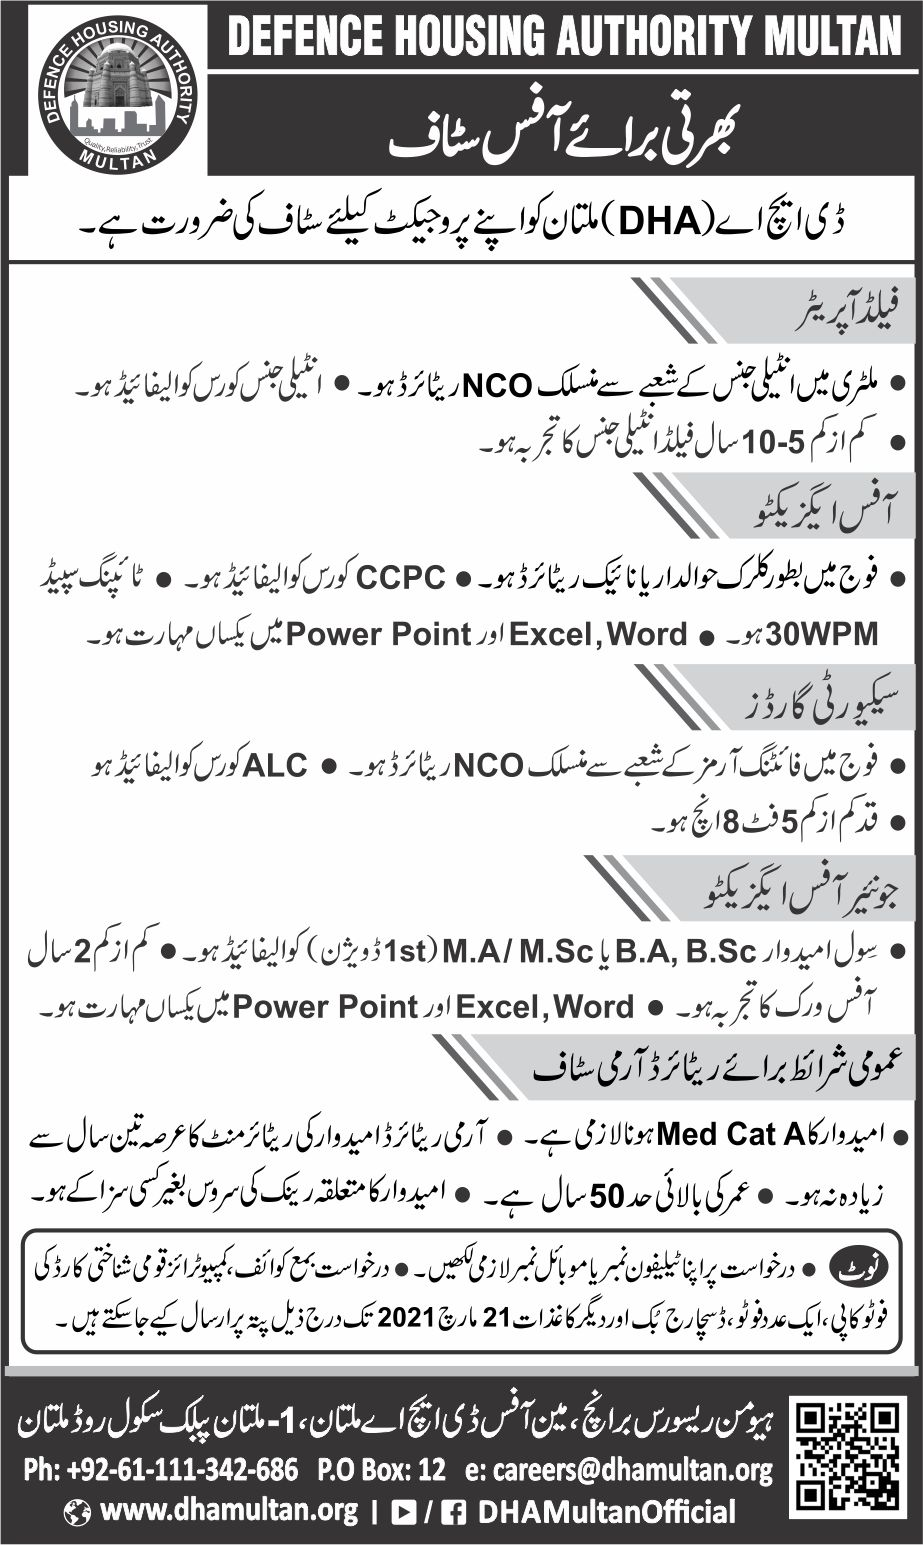 DHA Defense Housing Authority Multan Jobs 2021 Field Operator ,Office Executive, Security Guard, Junior Office Executive  Latest jobs in DHA